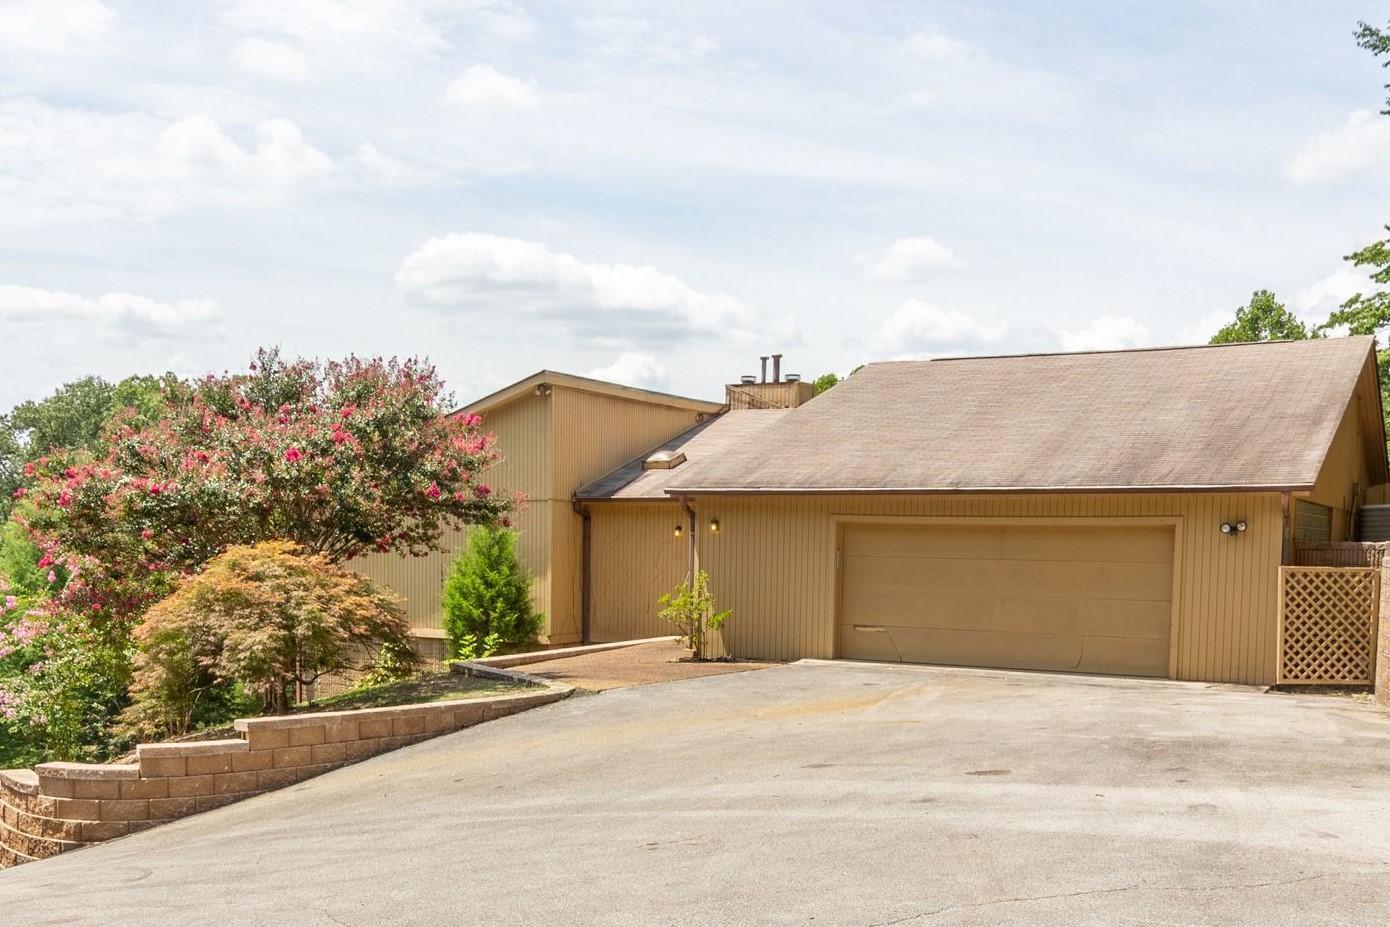 3407 Kings Cove Ln, Chattanooga, TN 37416